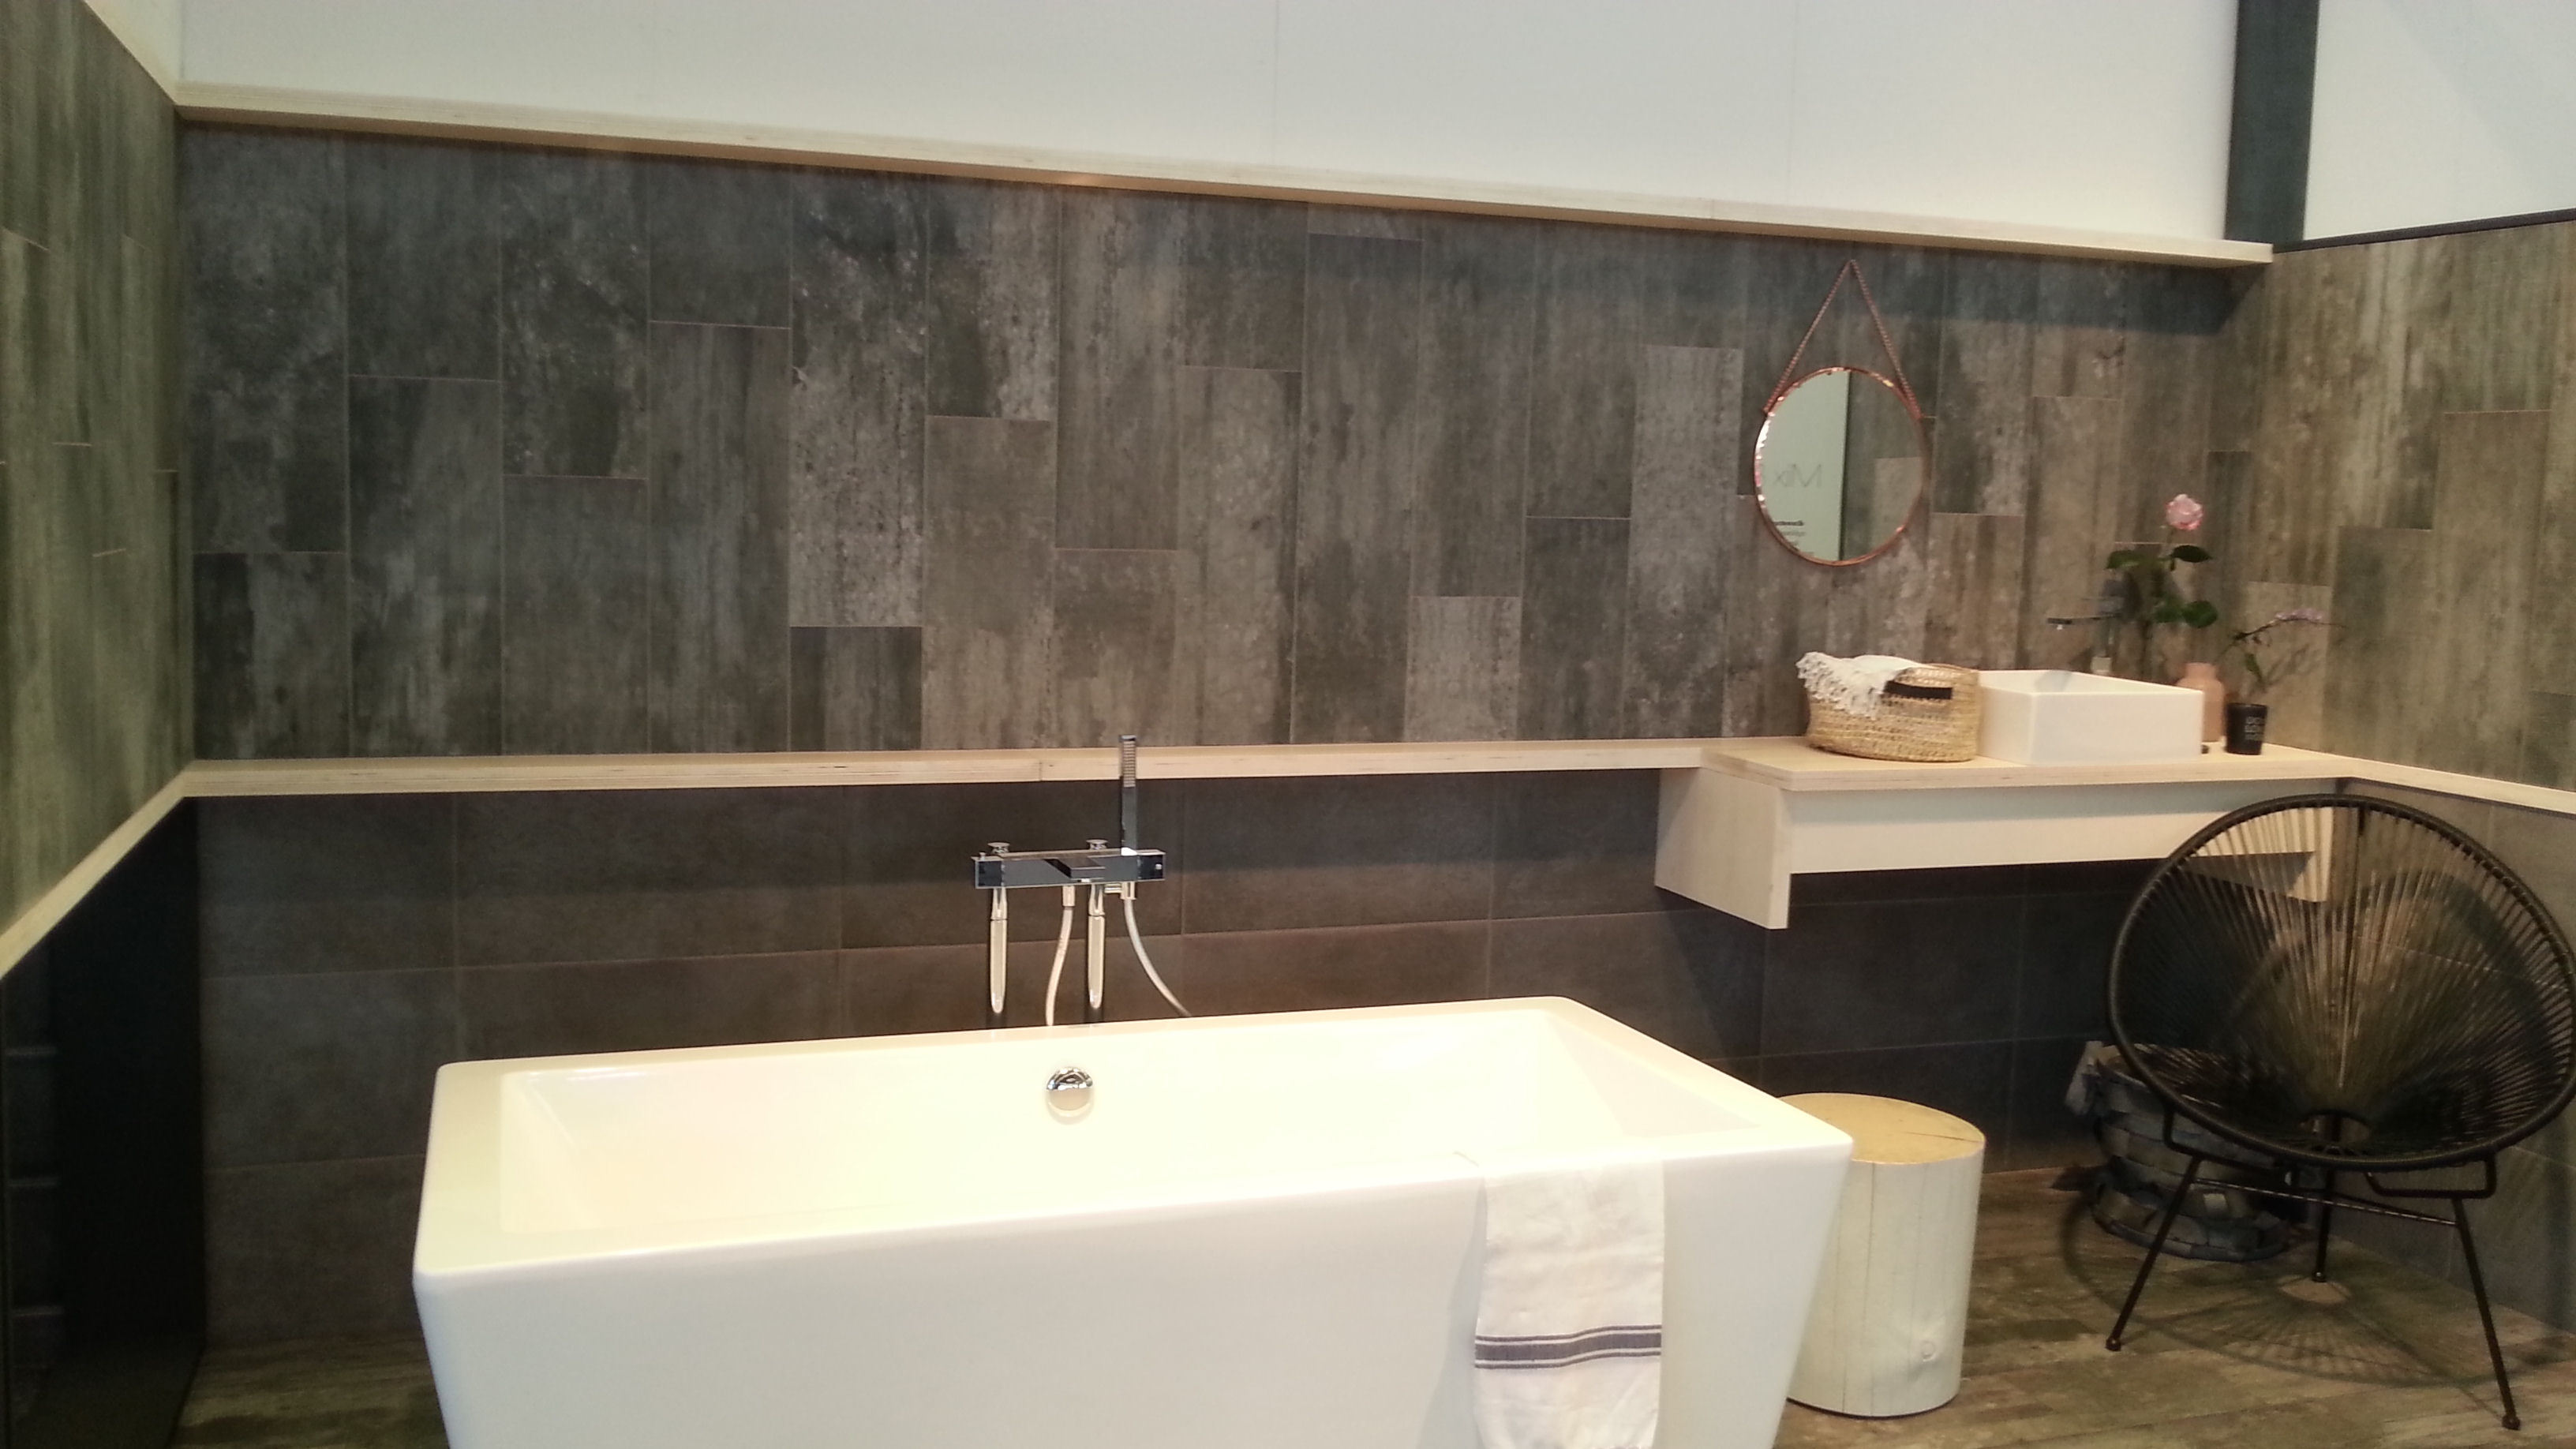 Vt wonen keuken 2015 xnovinky vtwonen keuken houten - Idee van interieurontwerp ...